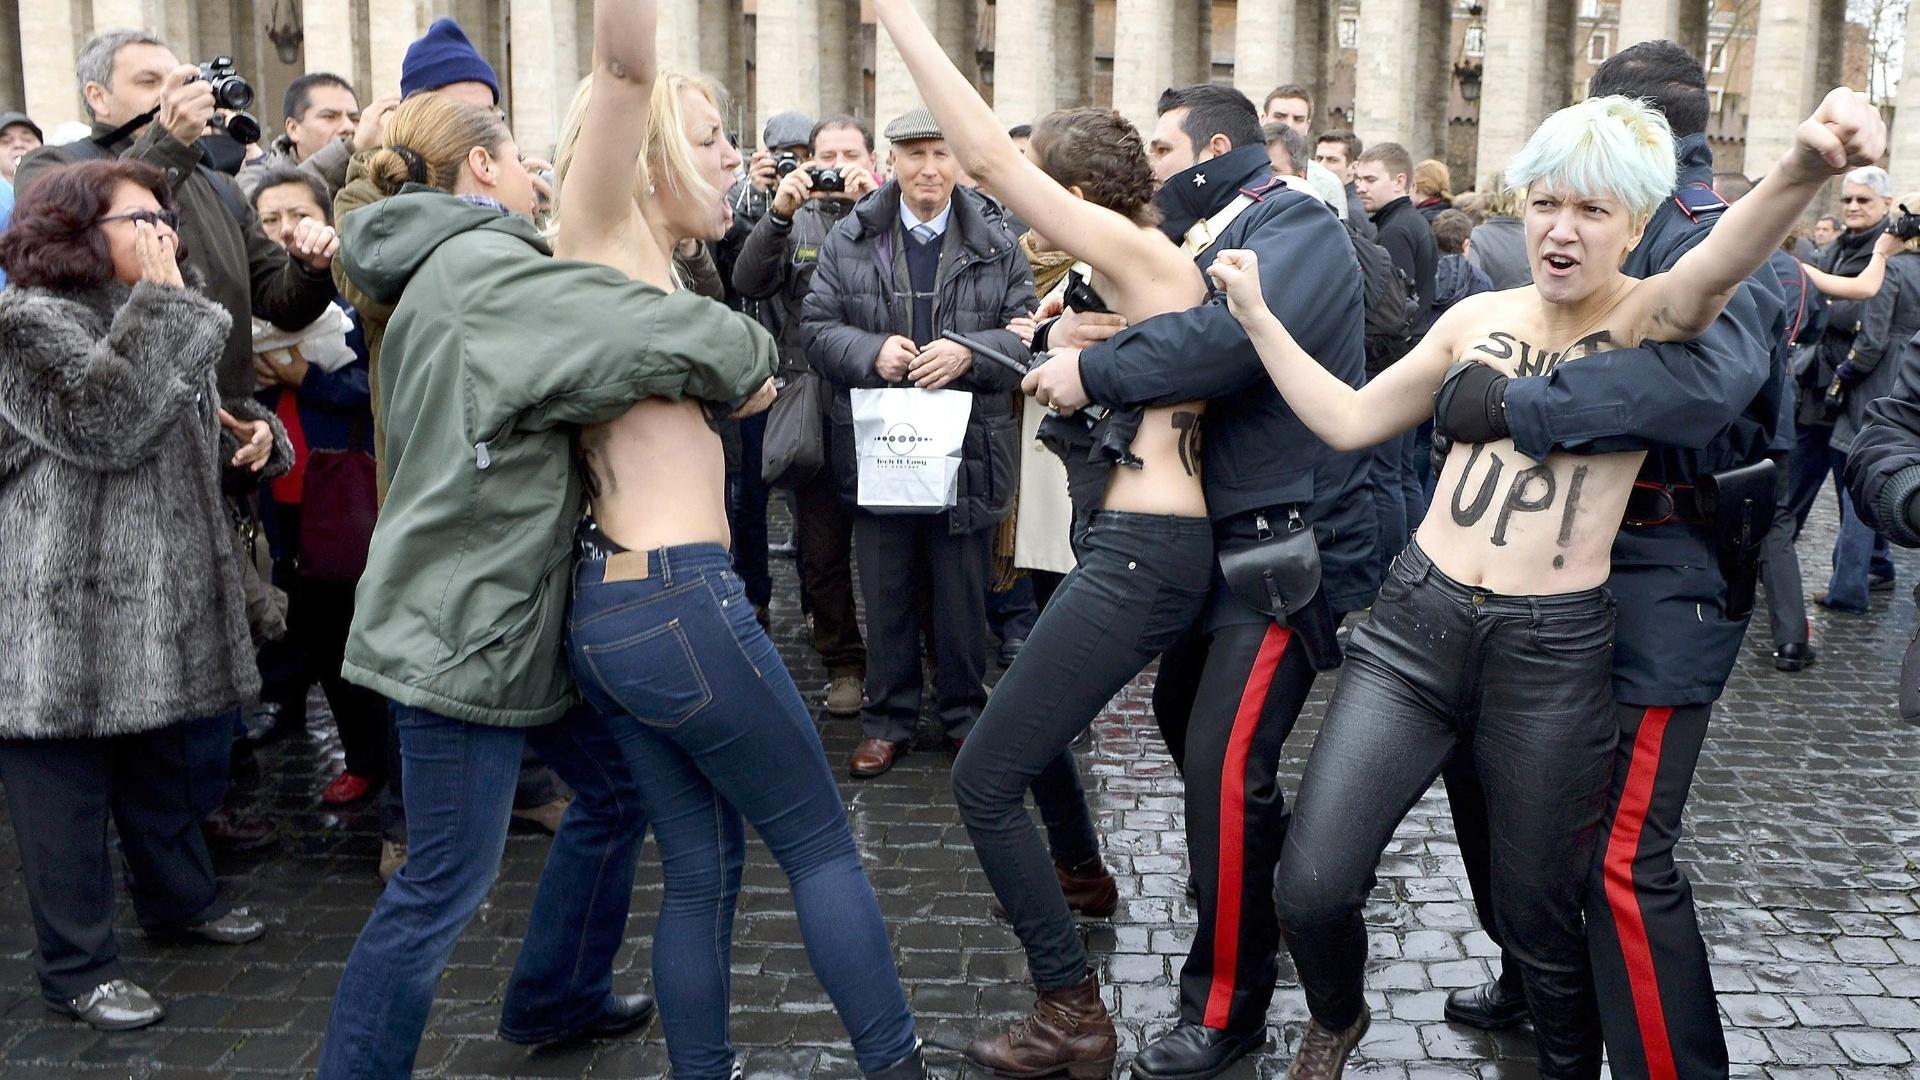 est100 一些攝影(some photos): FEMEN, Фемен, 費曼